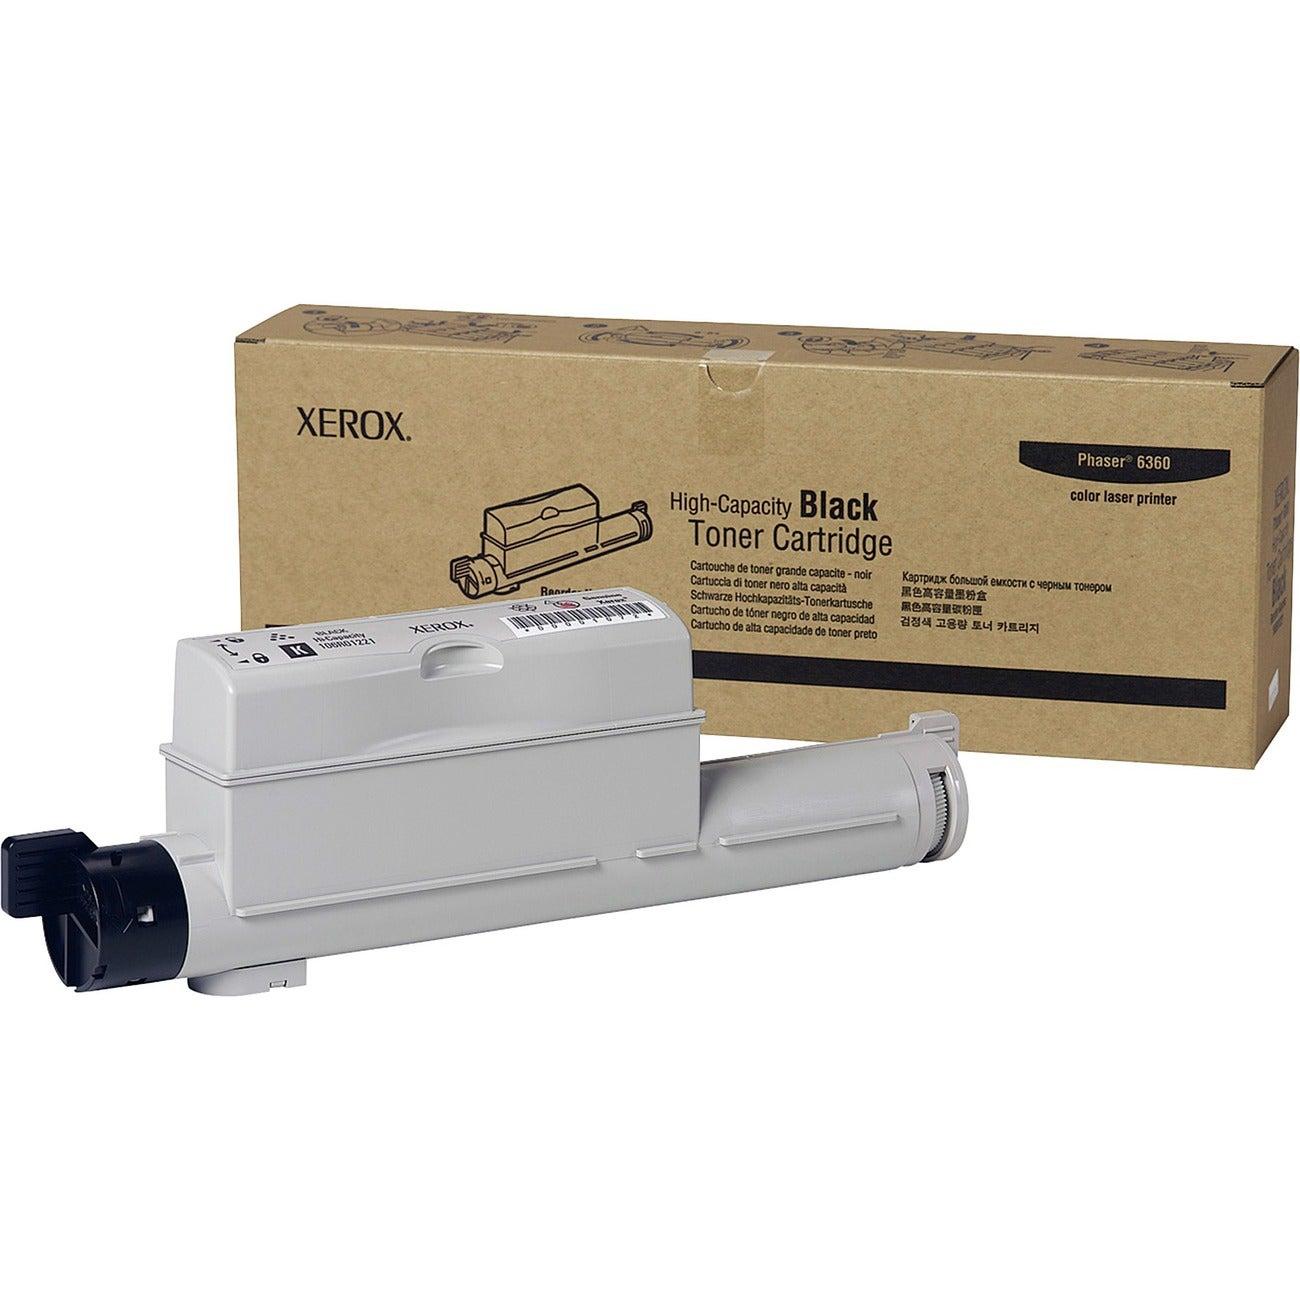 Xerox High Capacity Black Toner Cartridge For Phaser 6360 Printer